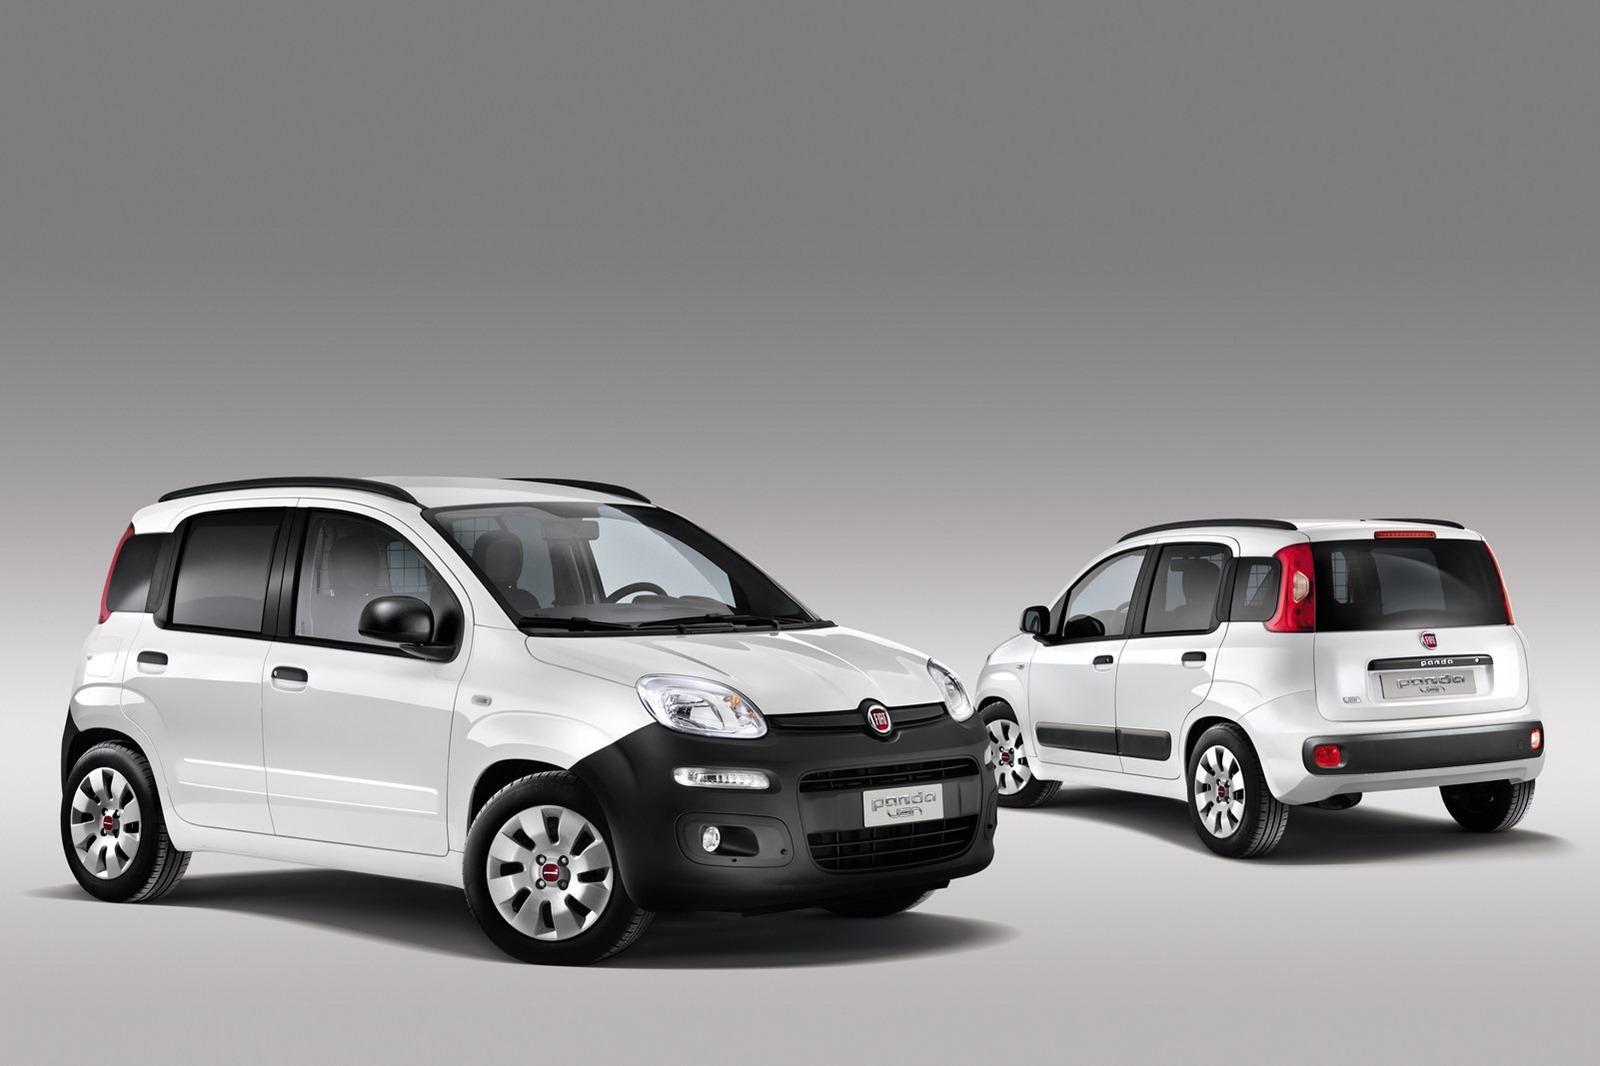 fiat professional bringing doblo cargo to 2011 cv show - autoevolution